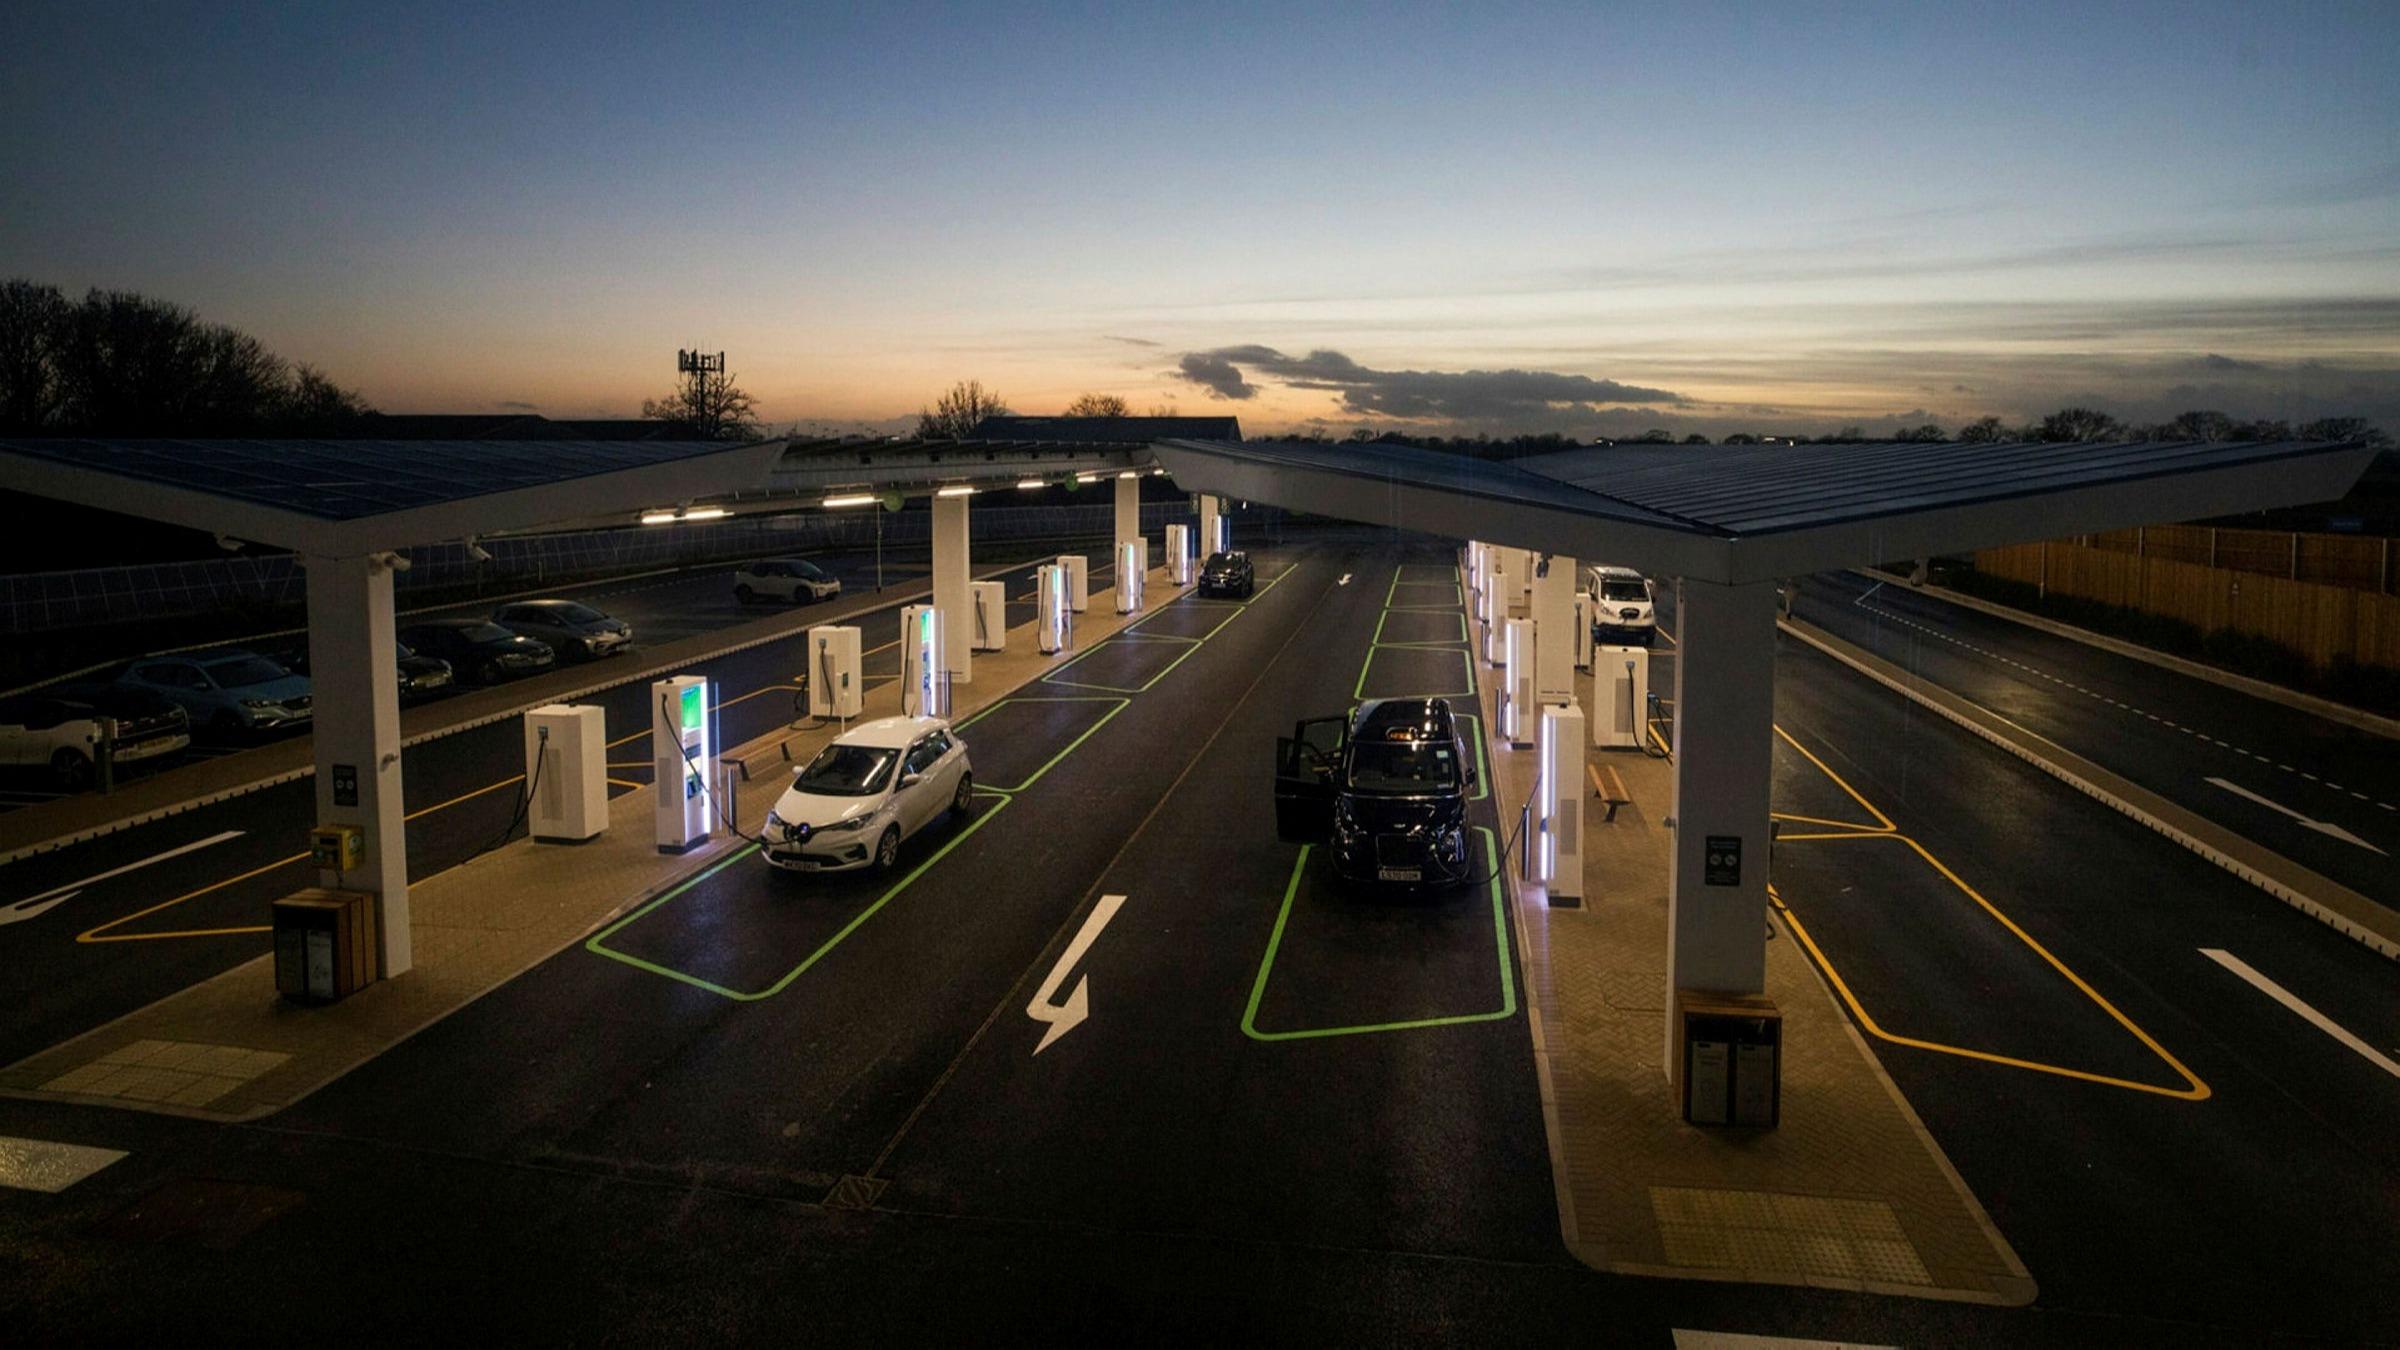 ft.com - Nathalie Thomas in Edinburgh and Kate Beioley in London - UK watchdog to probe electric vehicle motorway charging deal